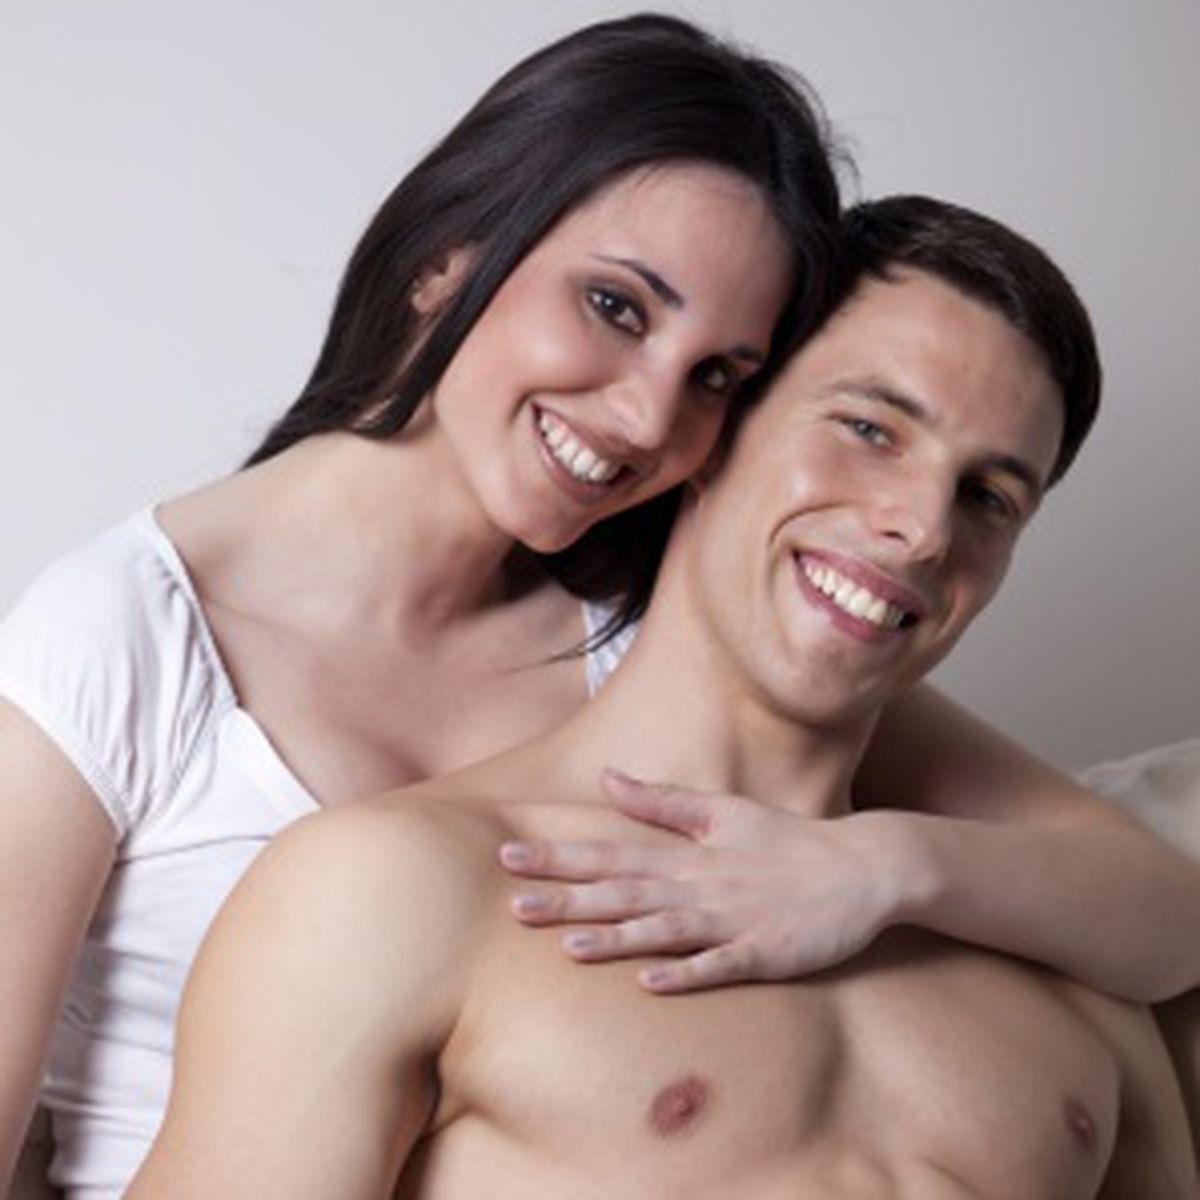 Vrei sa afli cum arata penisul lui fara sa-l dezbraci?! Uita-te la degete! - bogdanbarabas.ro